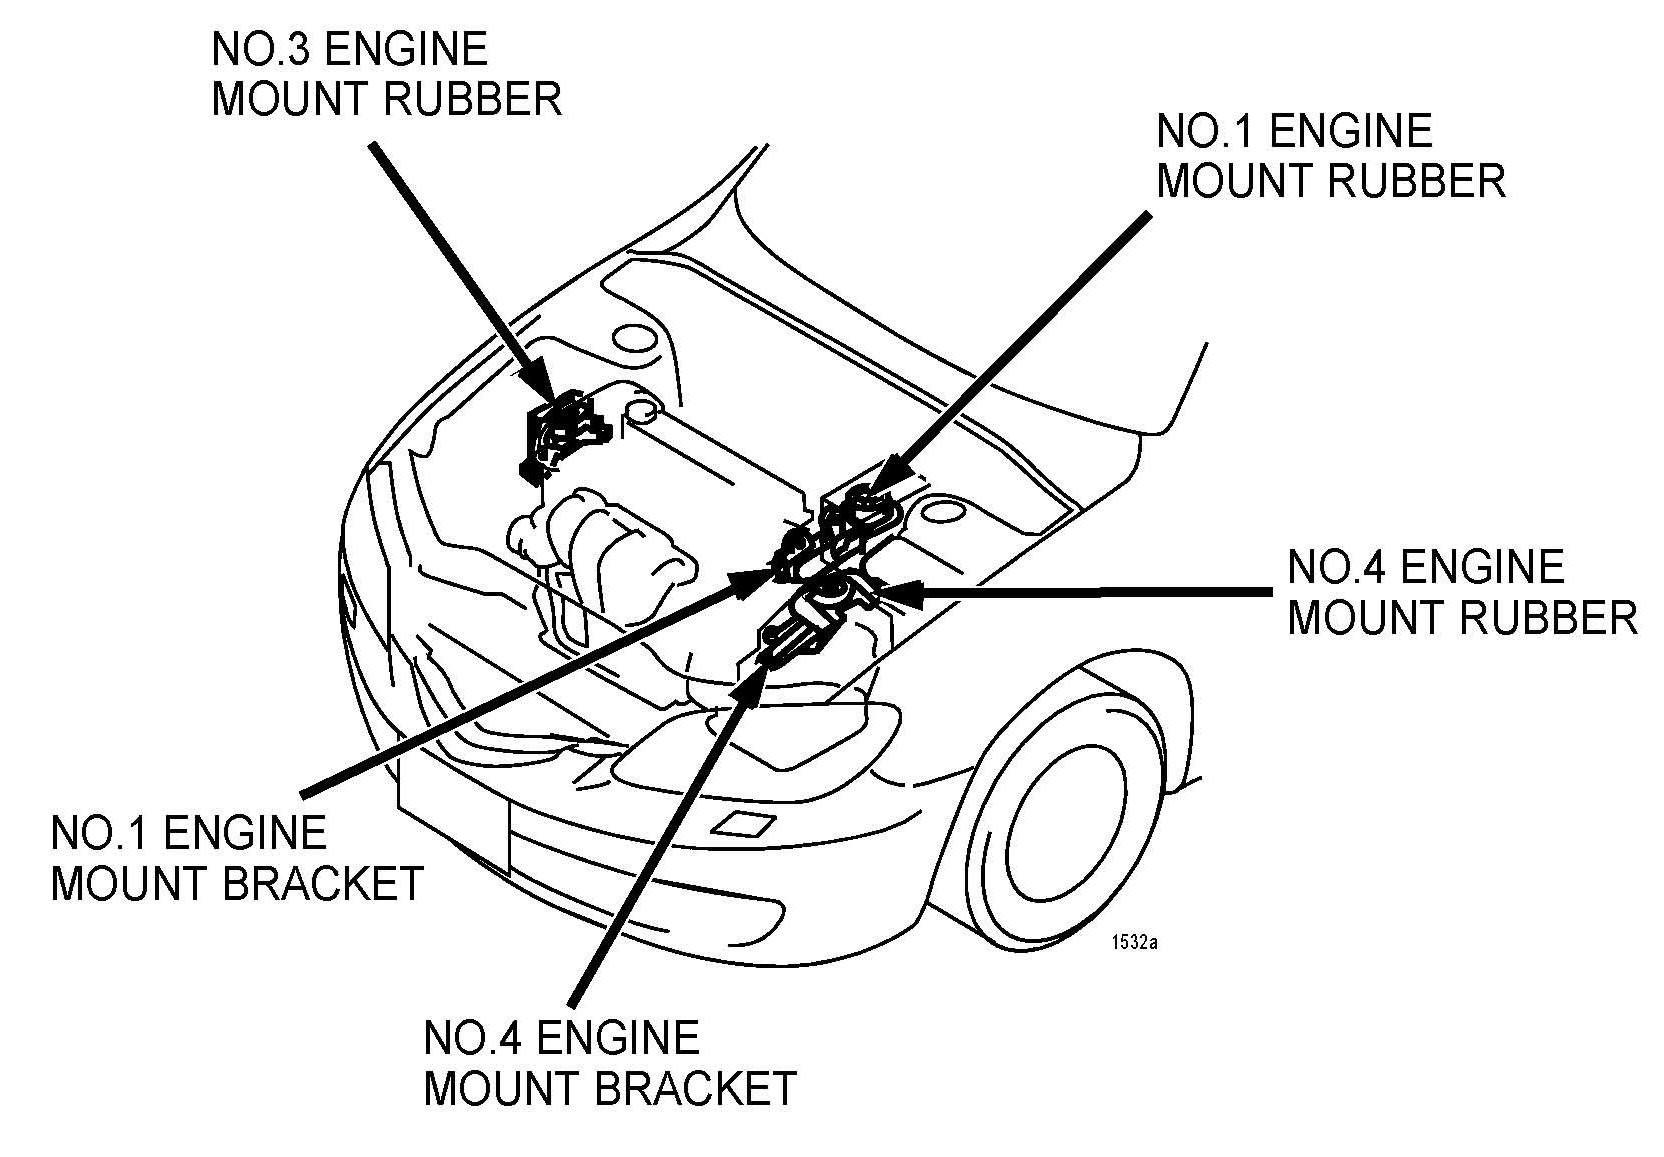 2008 Mazda 3 Engine Diagram 6 My Hatchback 2004 Crusing Between 58 To 63 Mph I